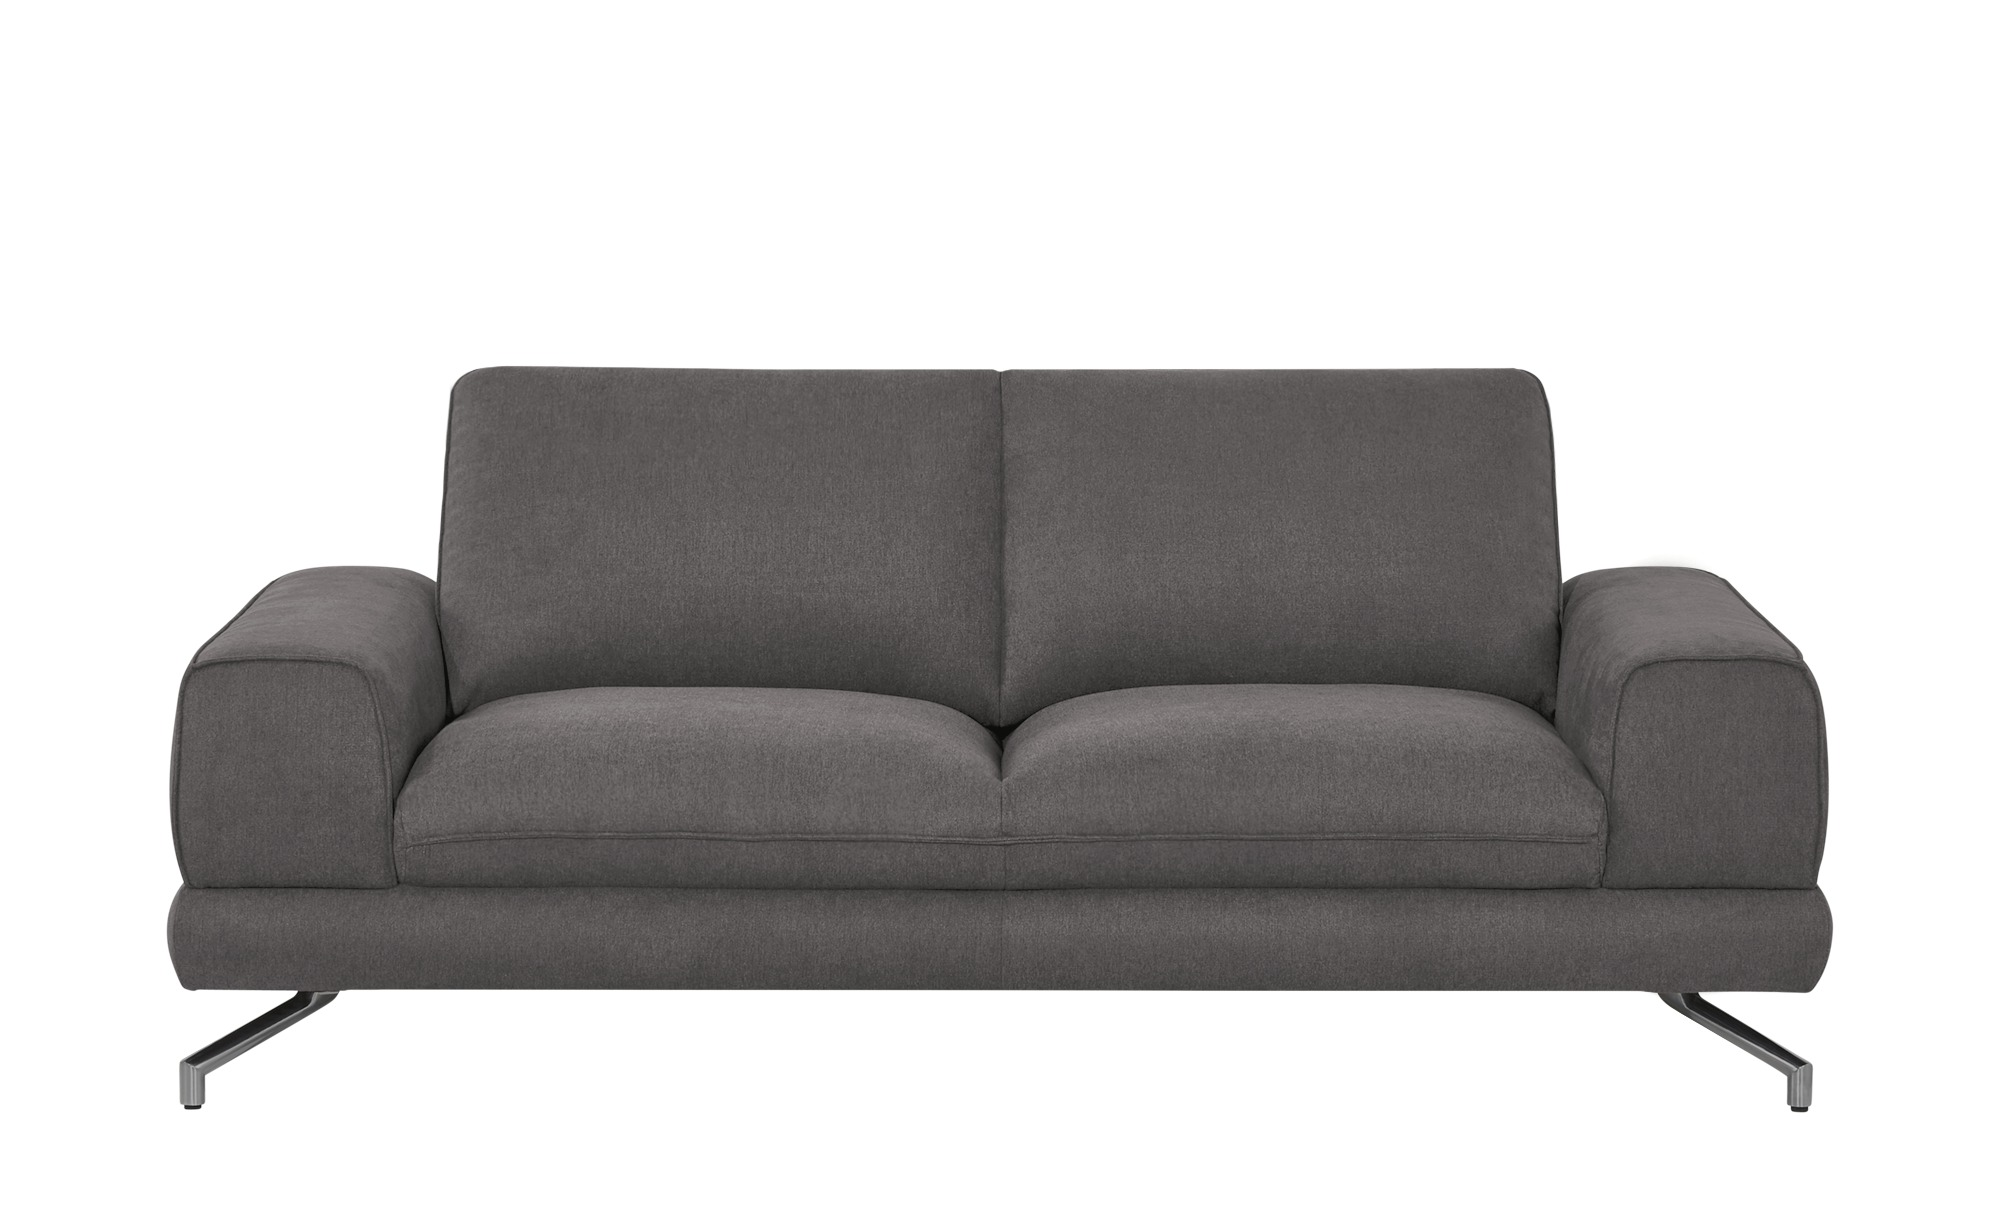 smart Sofa 2,5-sitzig dunkelgrau - Stoff Bonika ¦ grau ¦ Maße (cm): B: 198 H: 83 T: 95 Polstermöbel > Sofas > Einzelsofas - Höffner